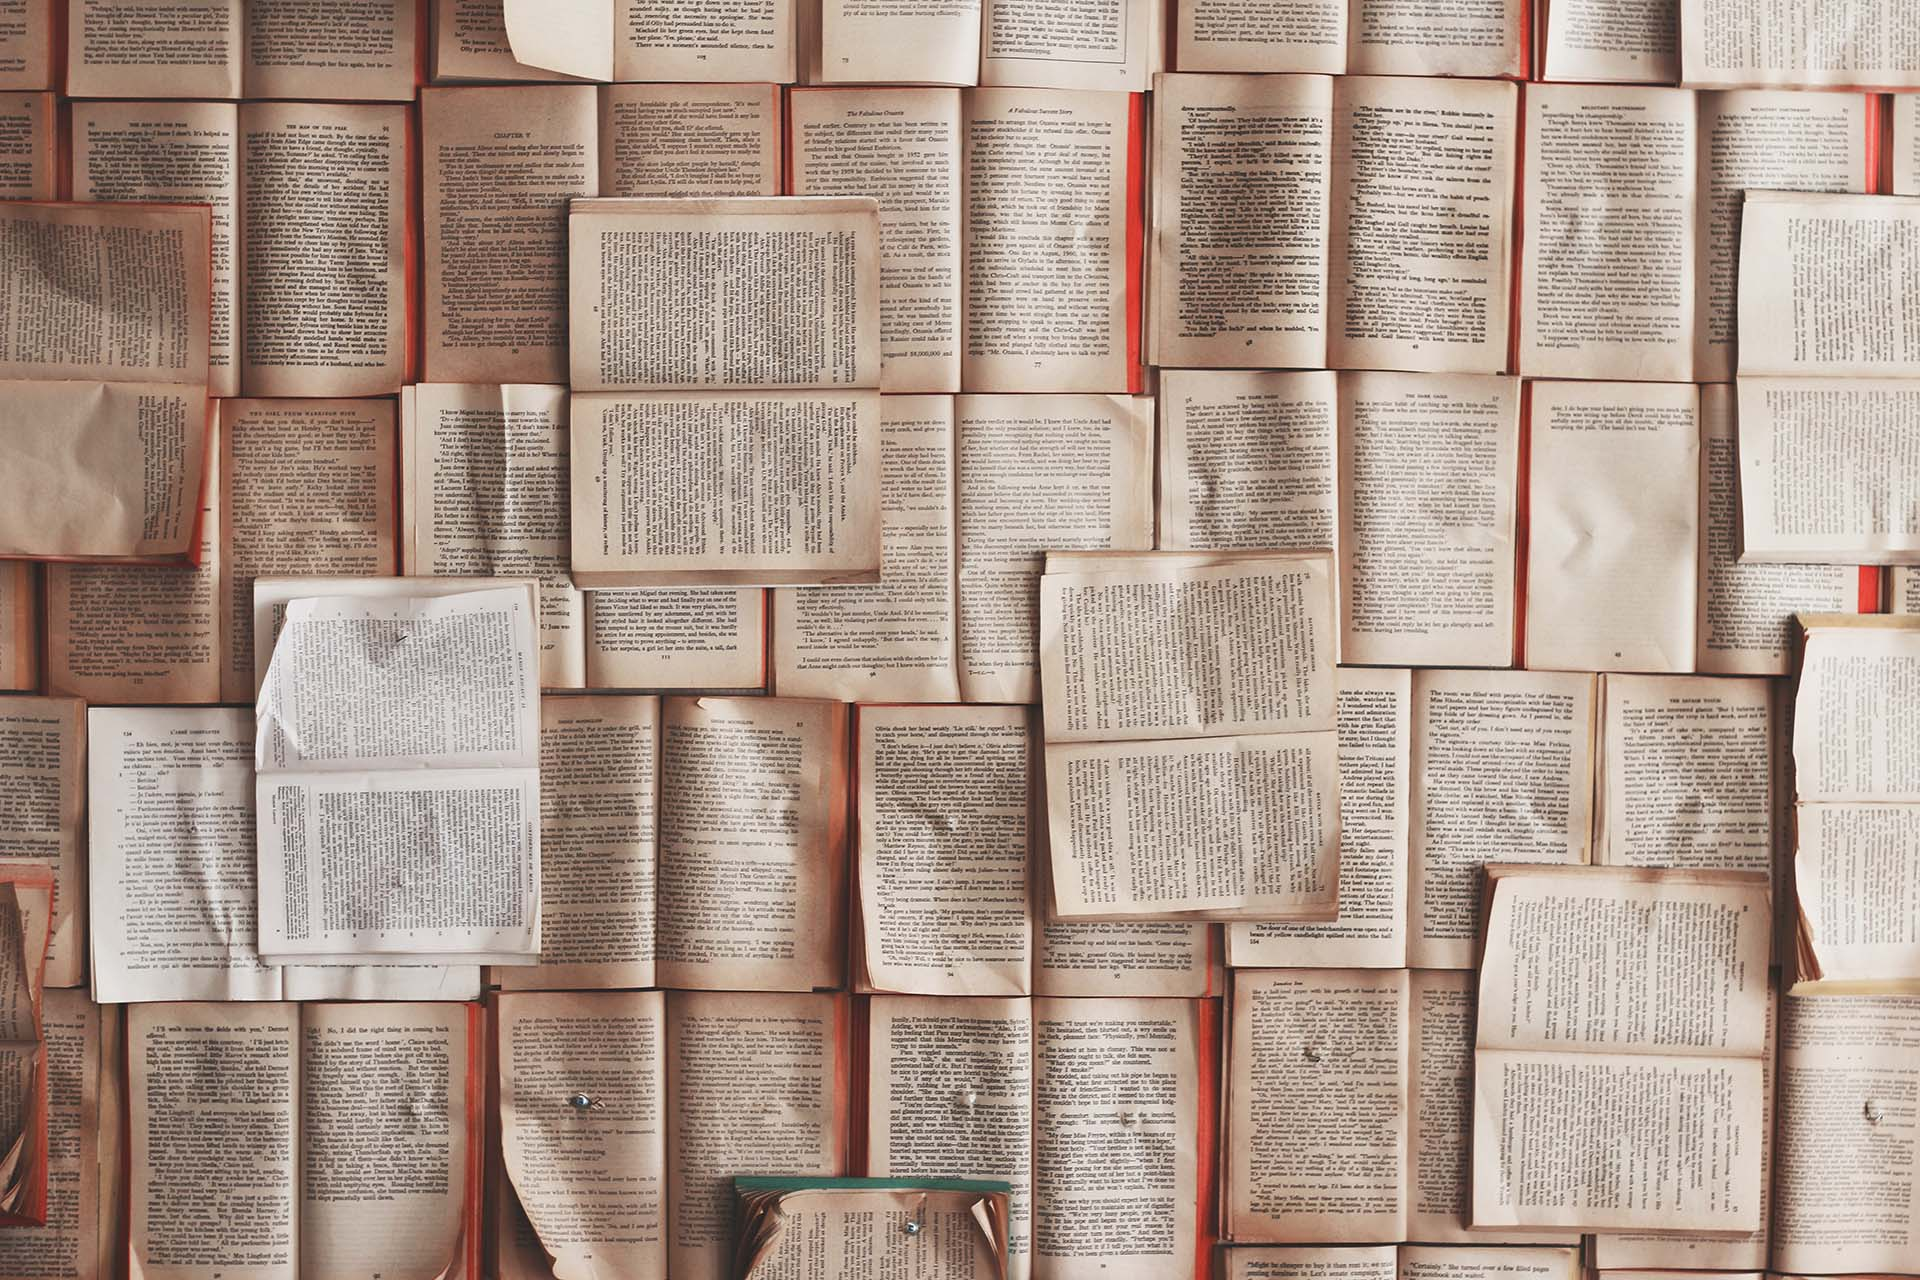 t2informatik Blog: Is content marketing worthwhile?